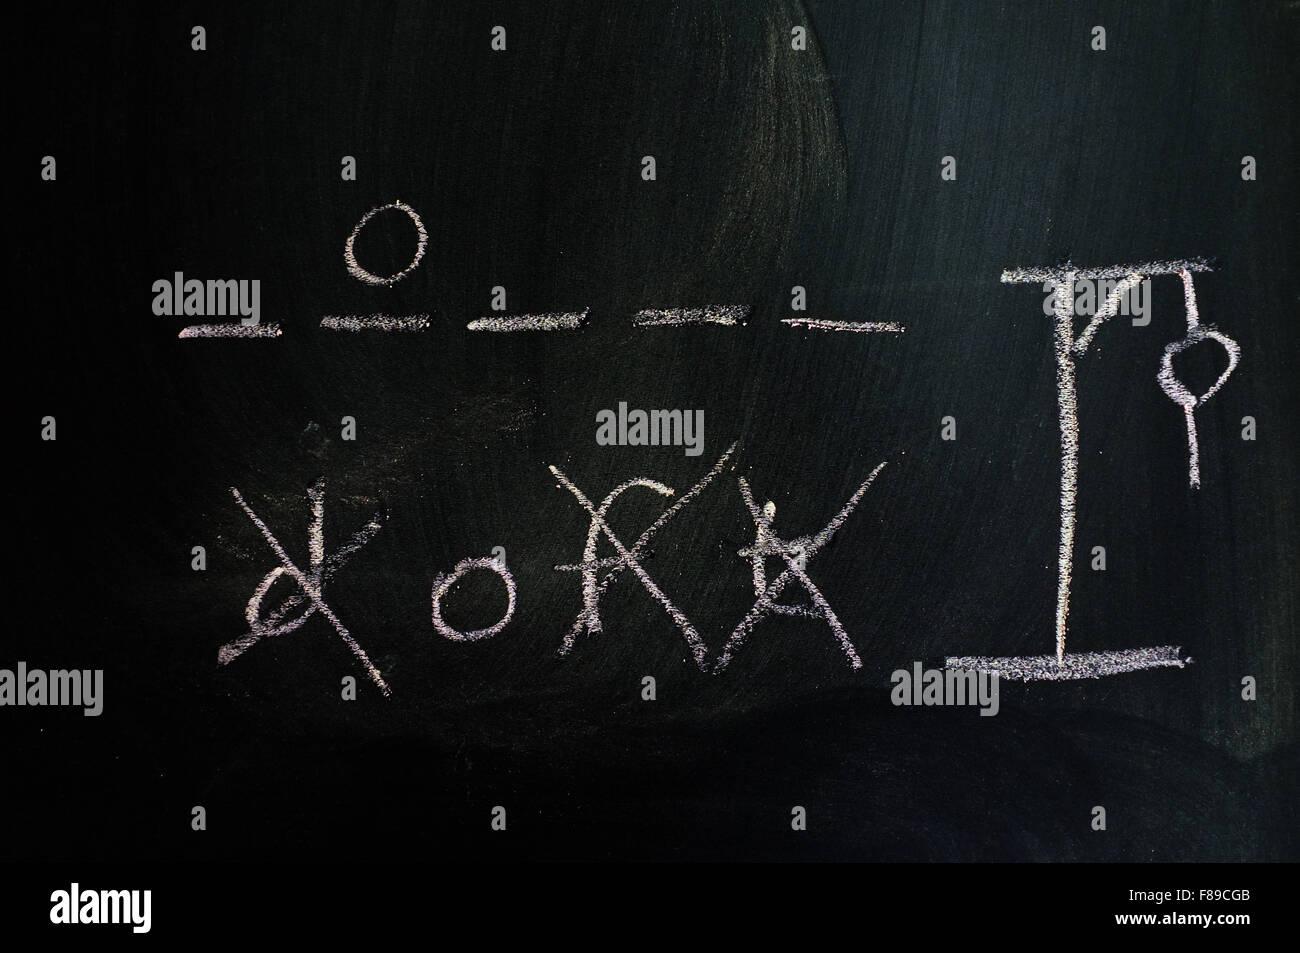 A game of hangman drawn on a blackboard in chalk. - Stock Image